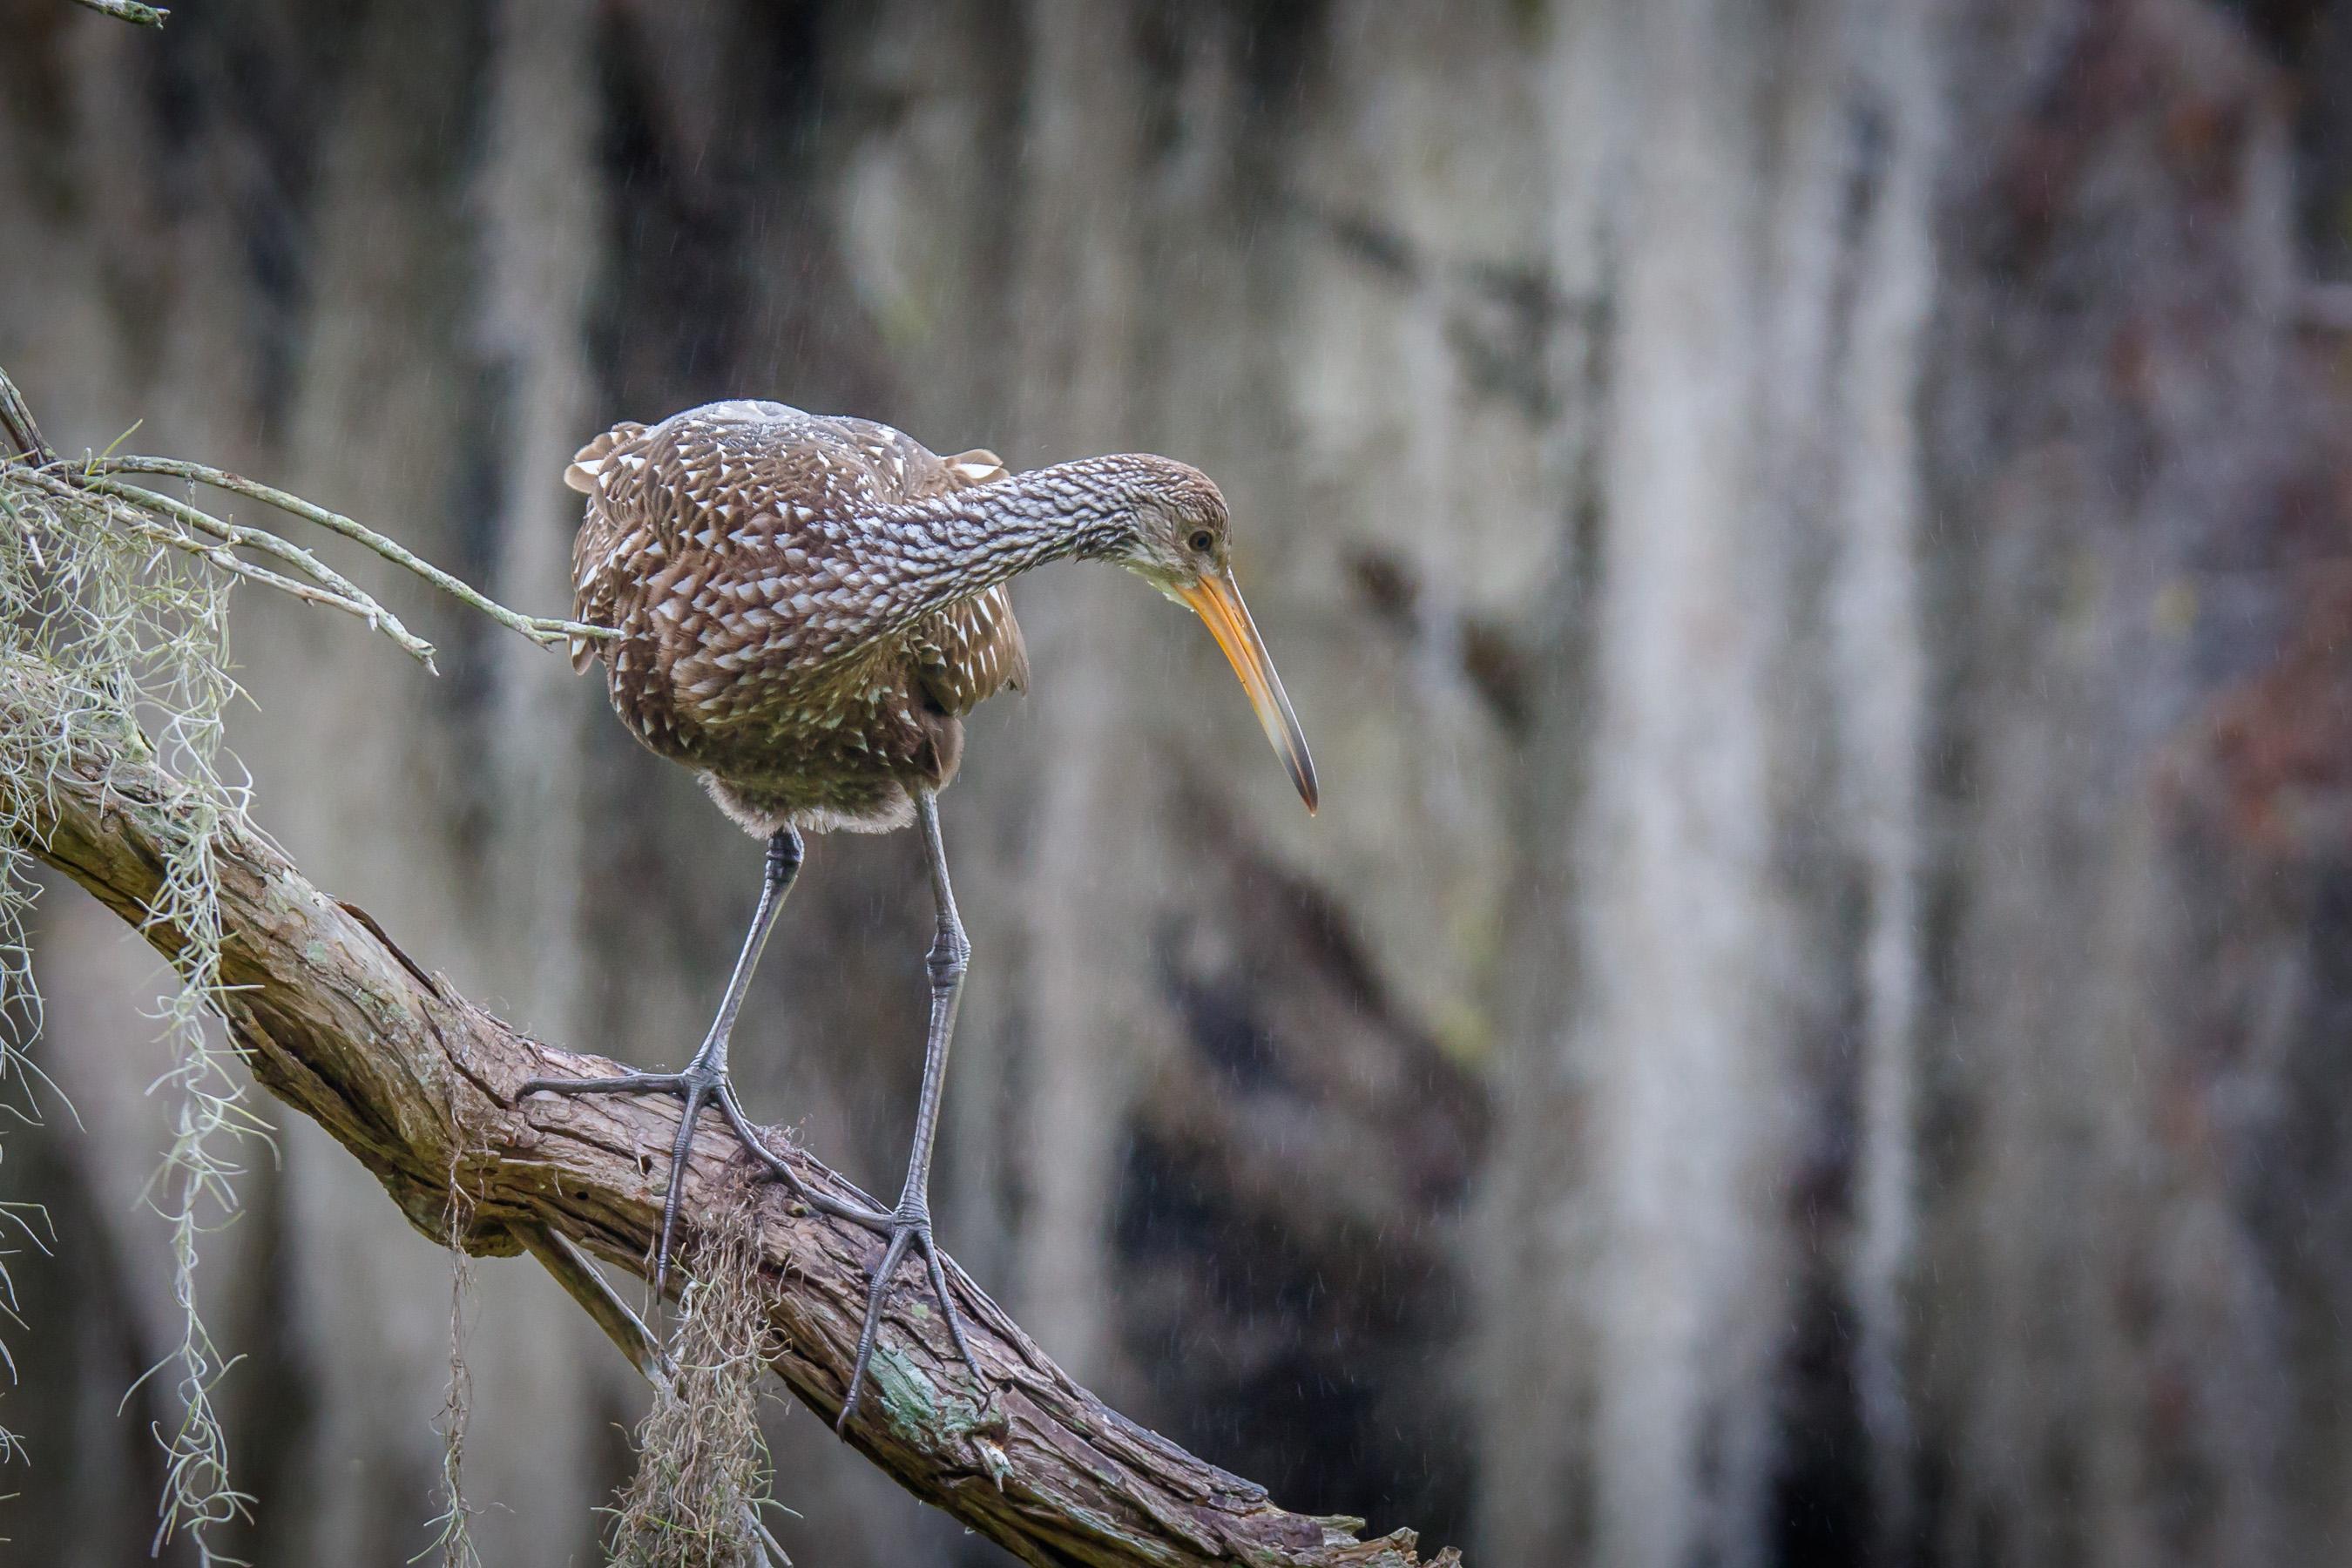 Limpkin on a Stick